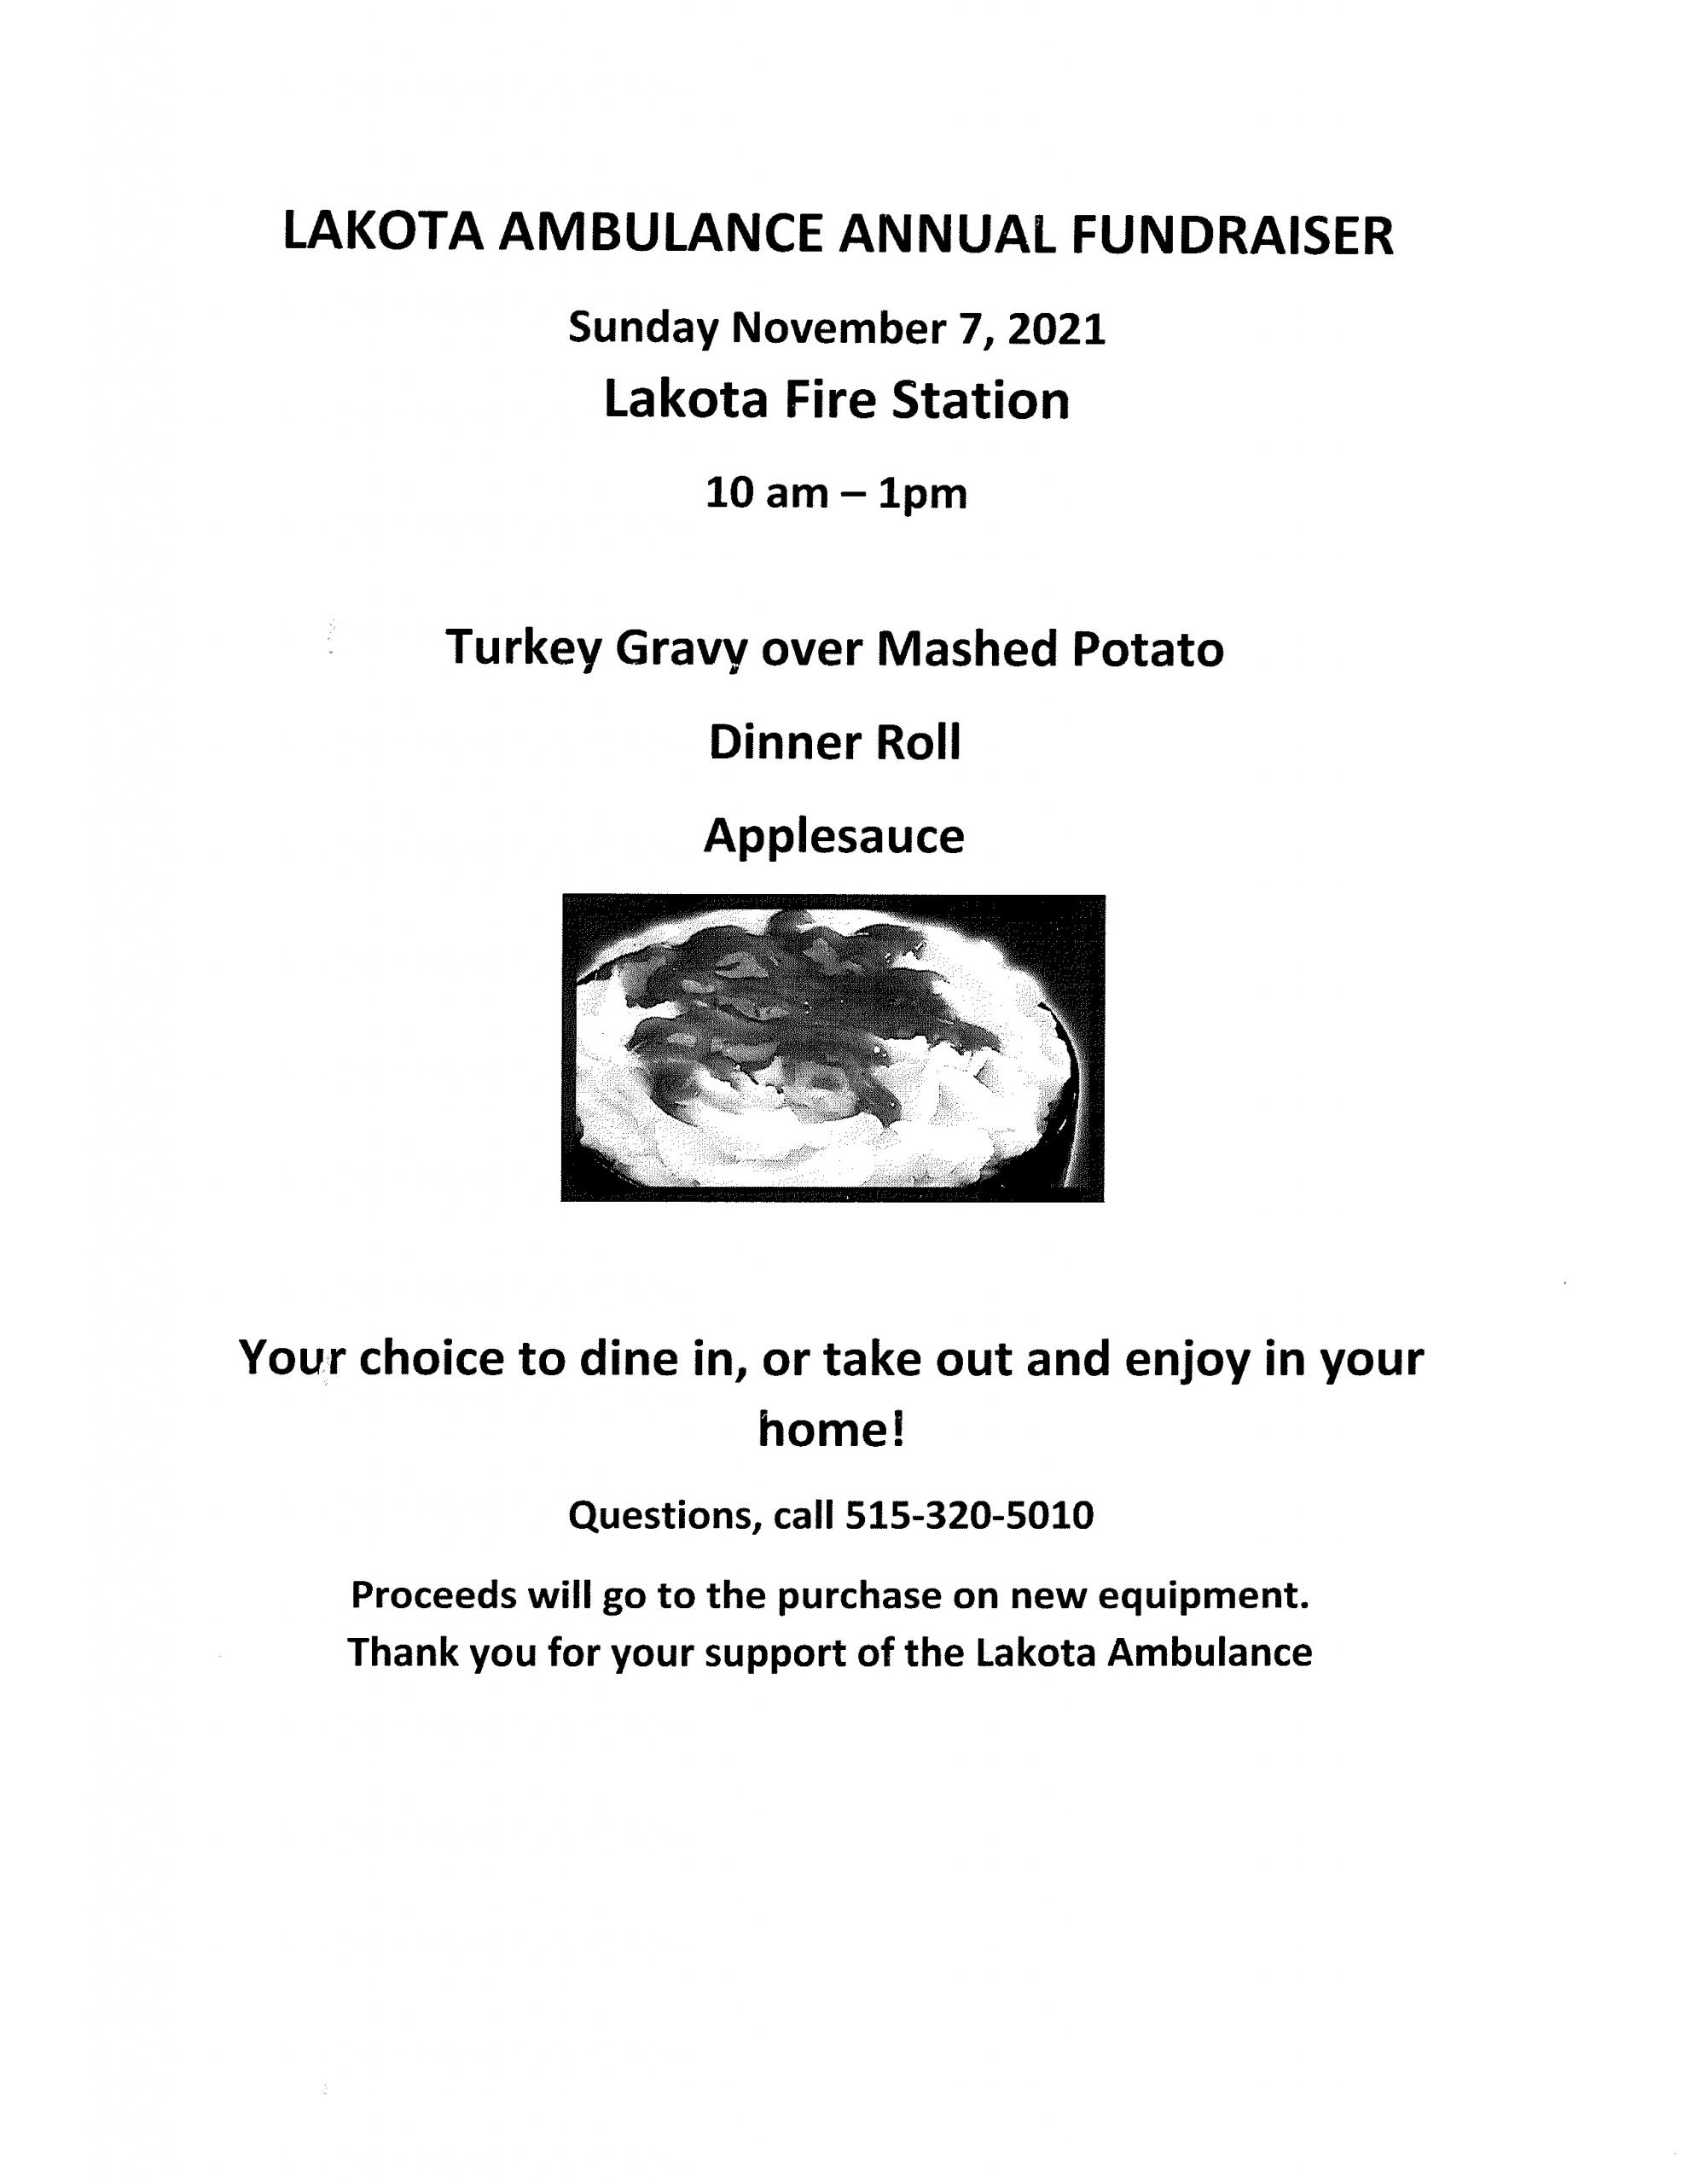 Lakota Ambulance Annual Fundraiser